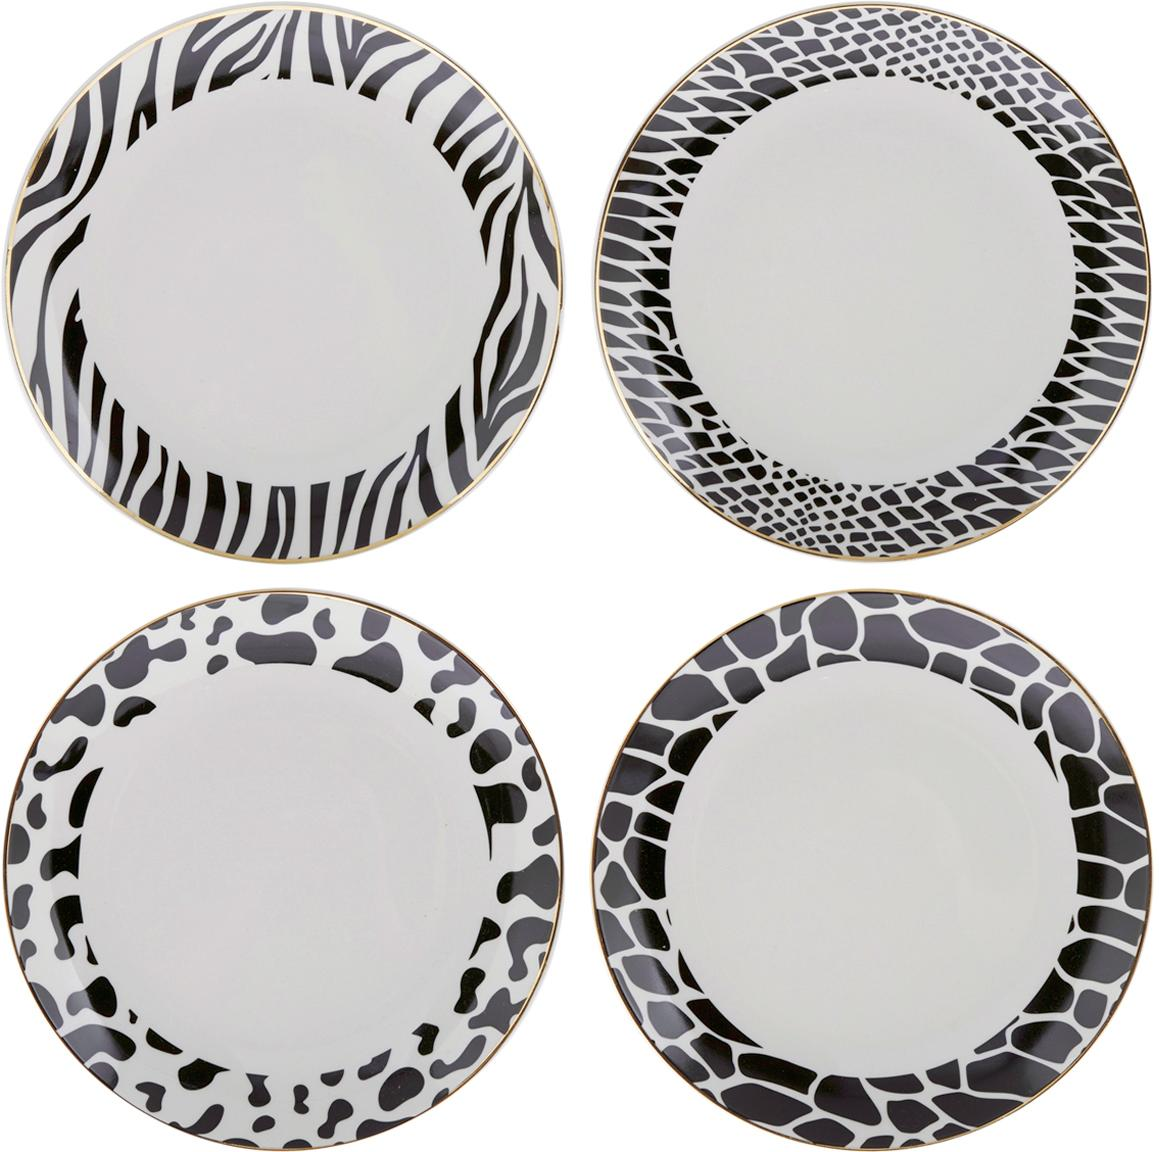 Frühstücksteller Wild Jungle, 4er-Set, Porzellan, Schwarz, Weiß, Ø 19 cm